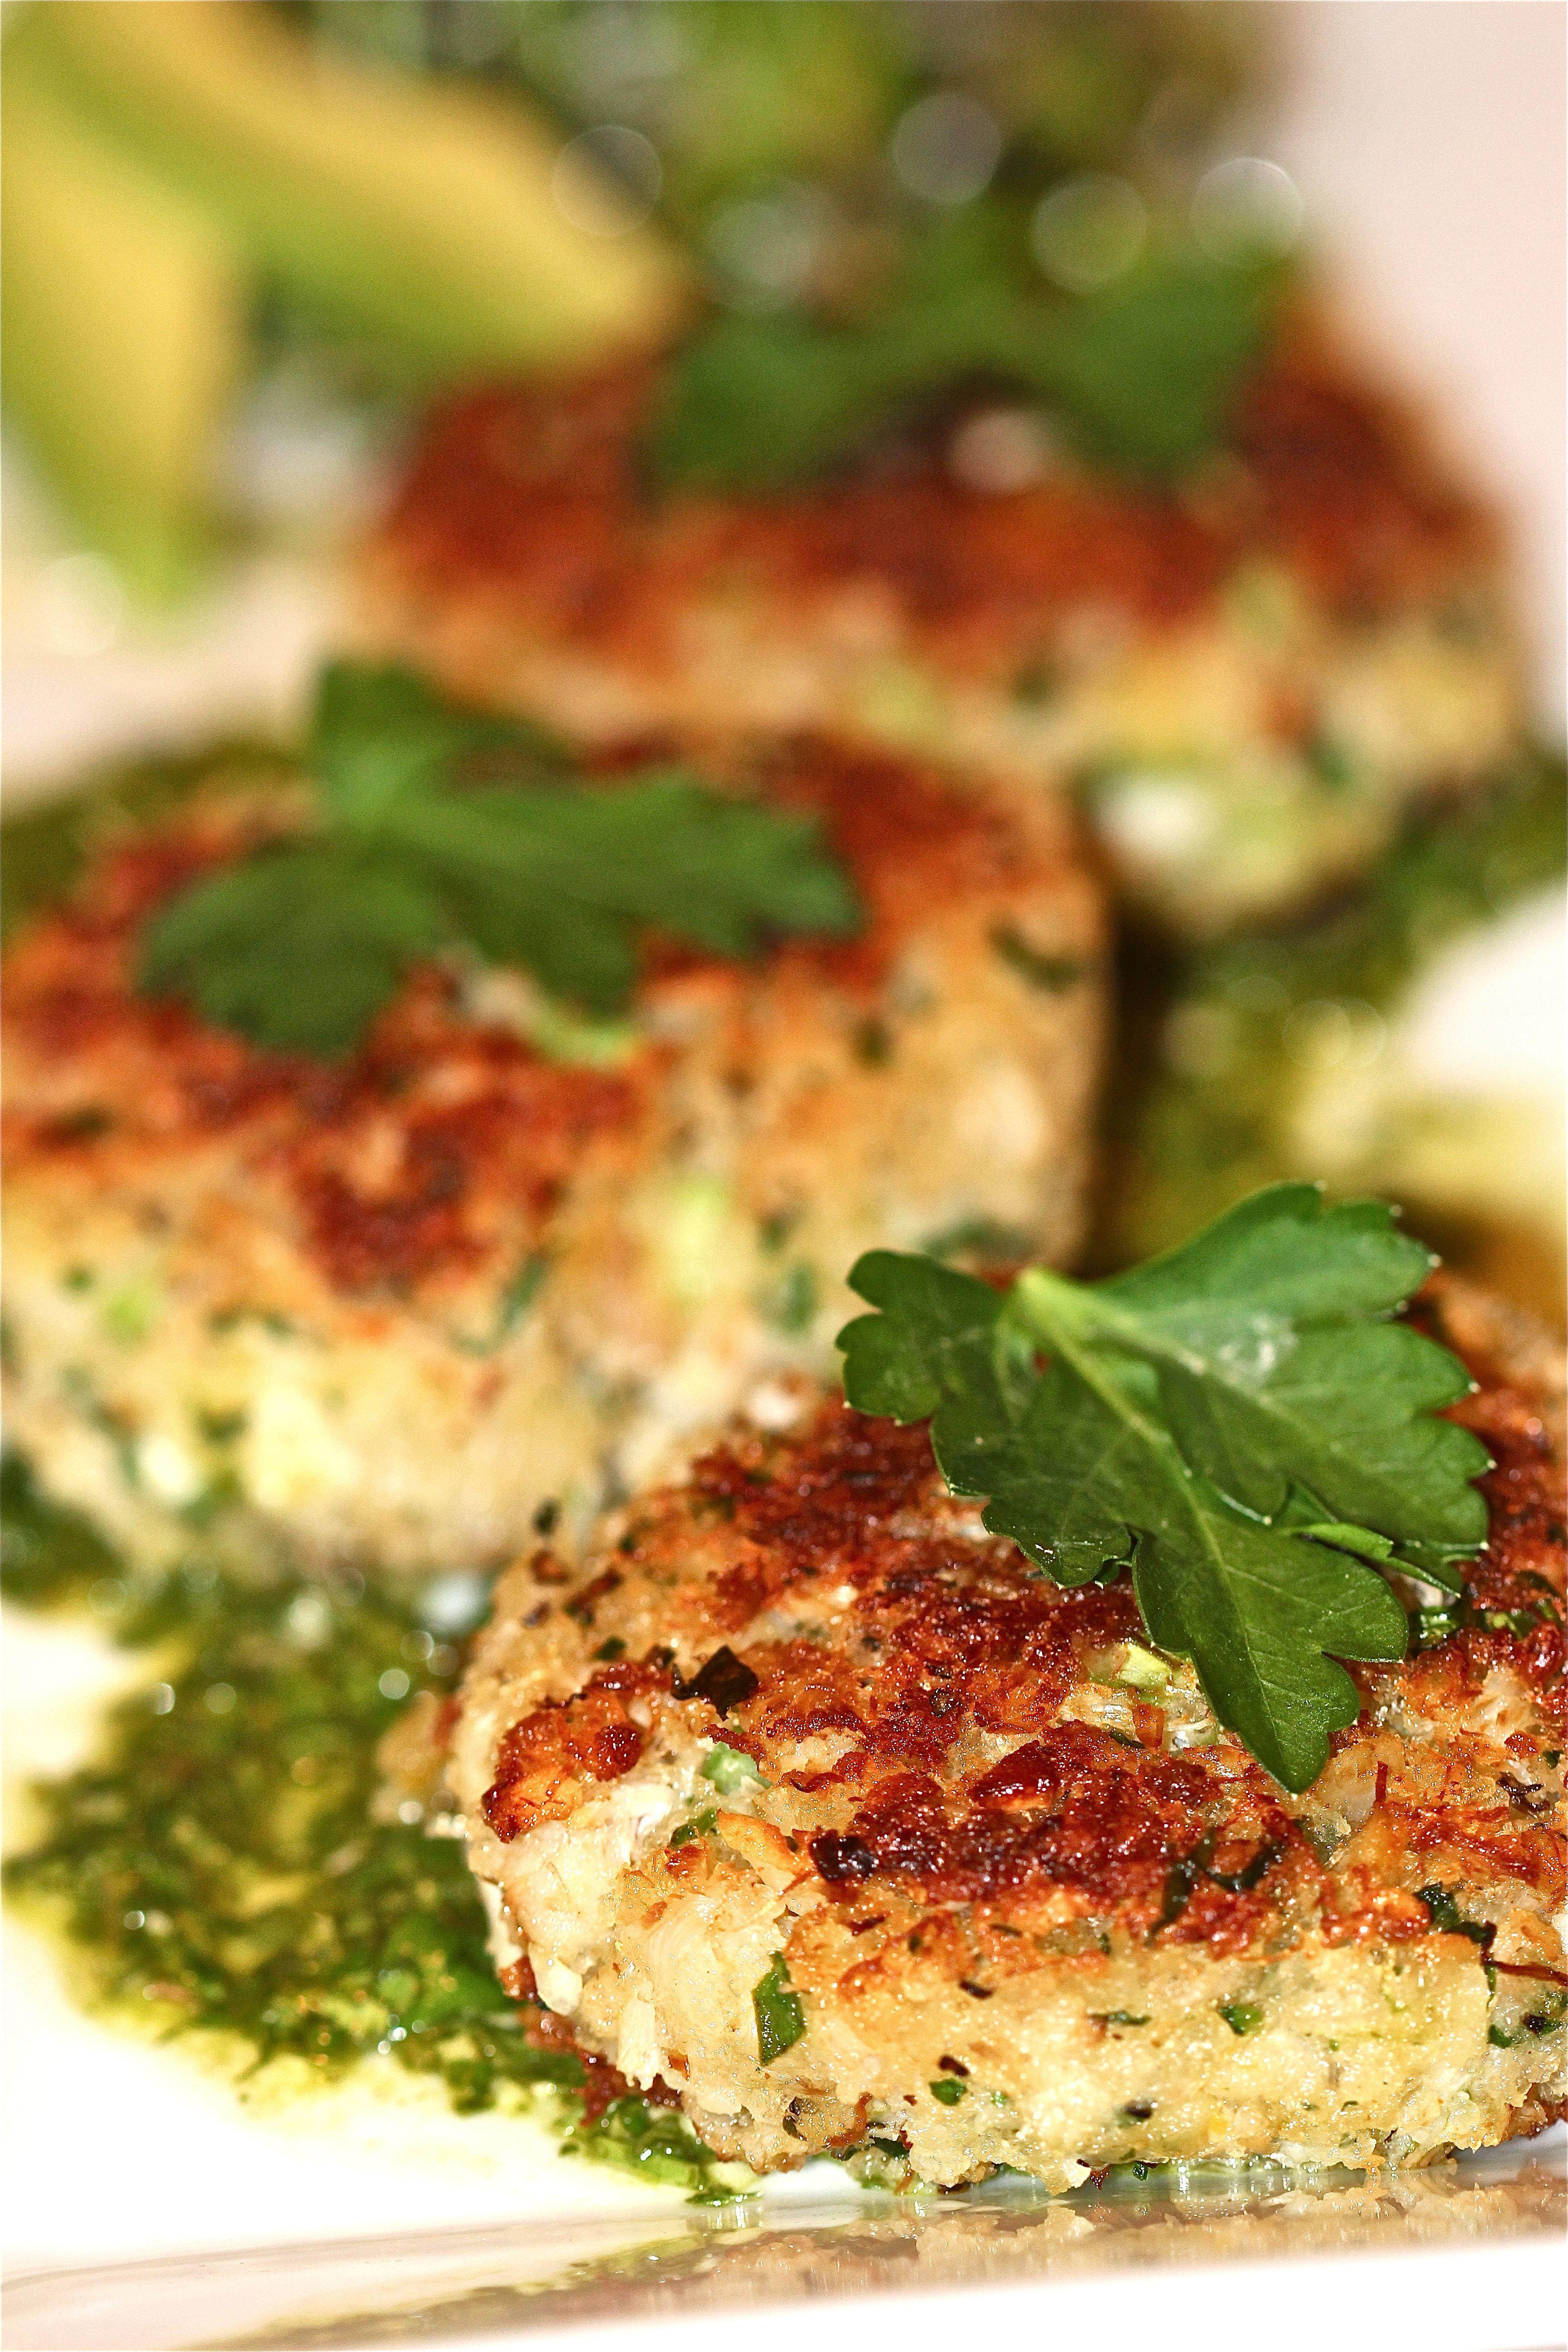 Crab Cakes With Lemon Cilantro Sauce Recipes Cooking Recipes Fish Recipes